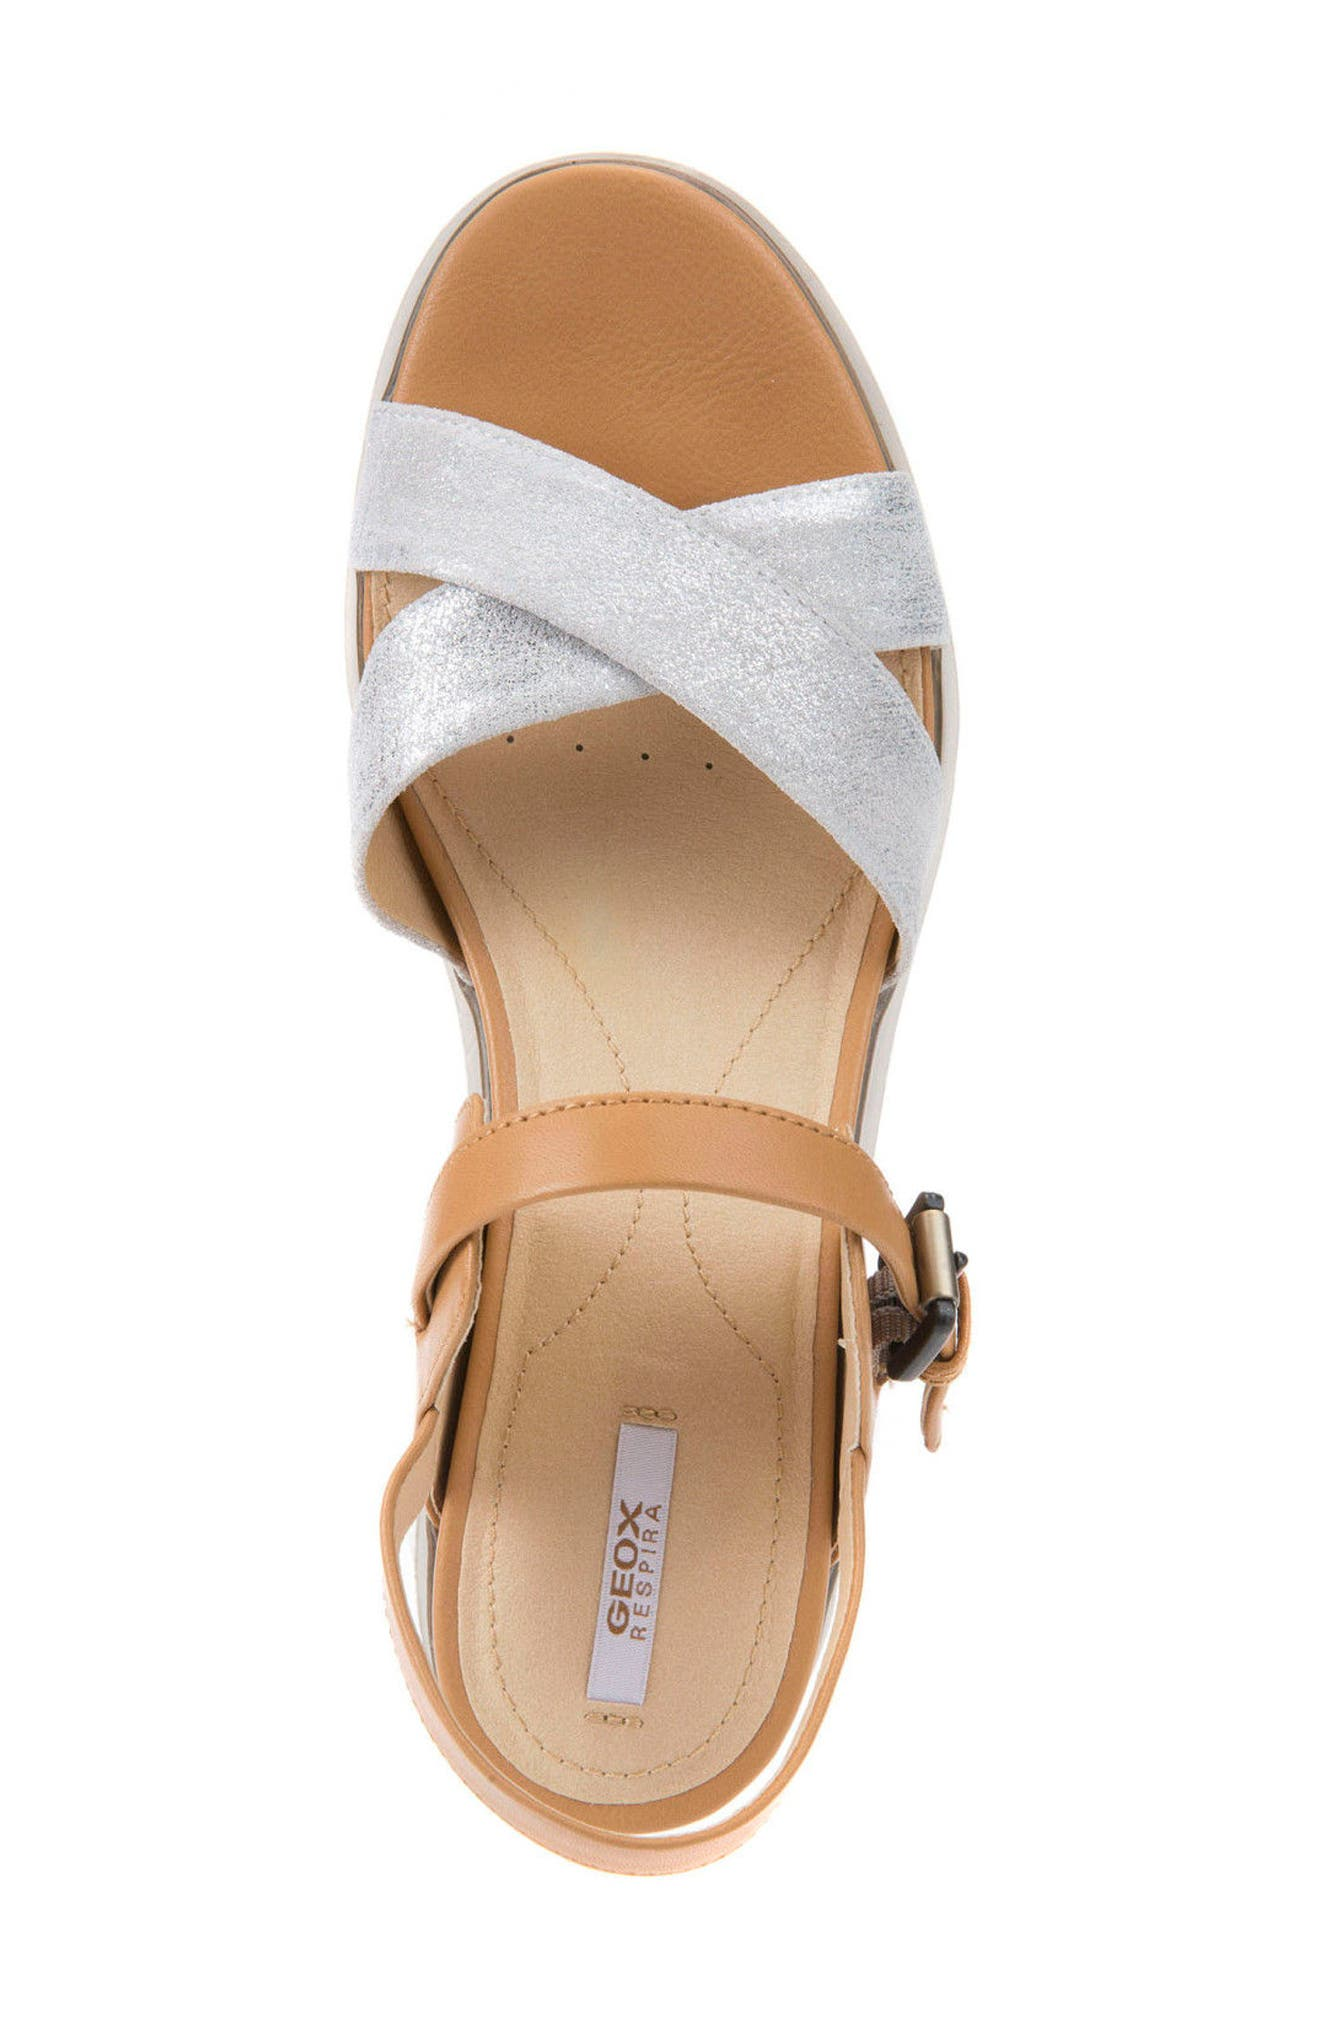 Radwa Platform Sandal,                             Alternate thumbnail 4, color,                             Off White Leather